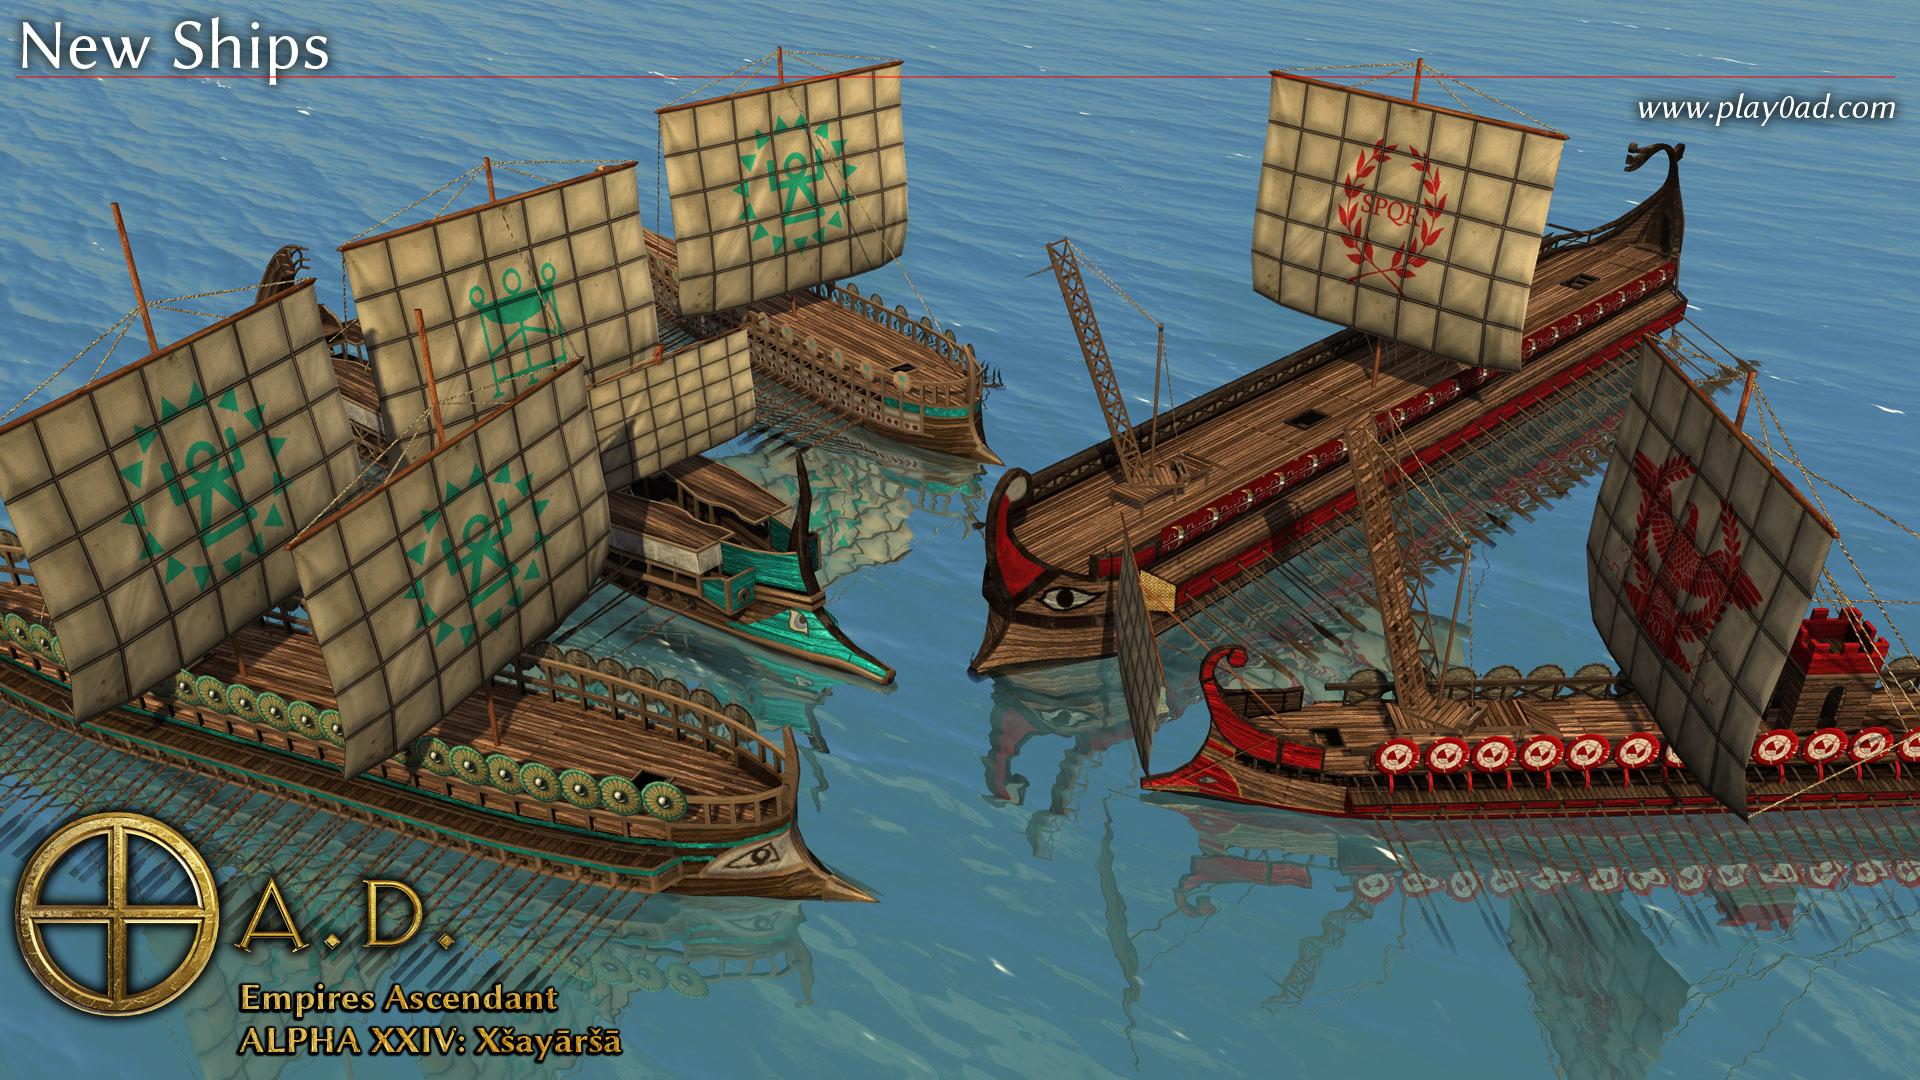 New Ships